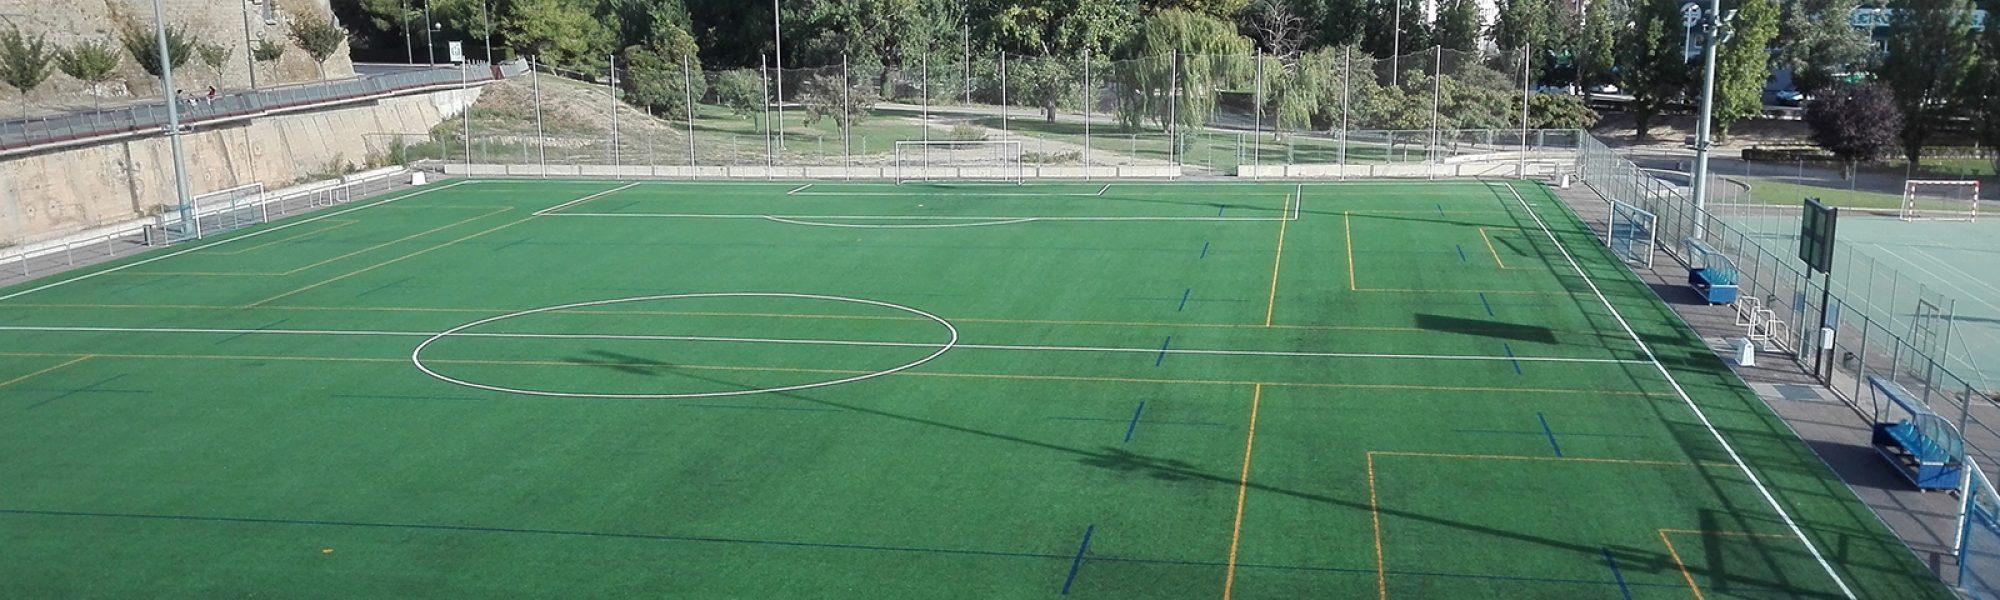 Foto campo futbol_1_ret22